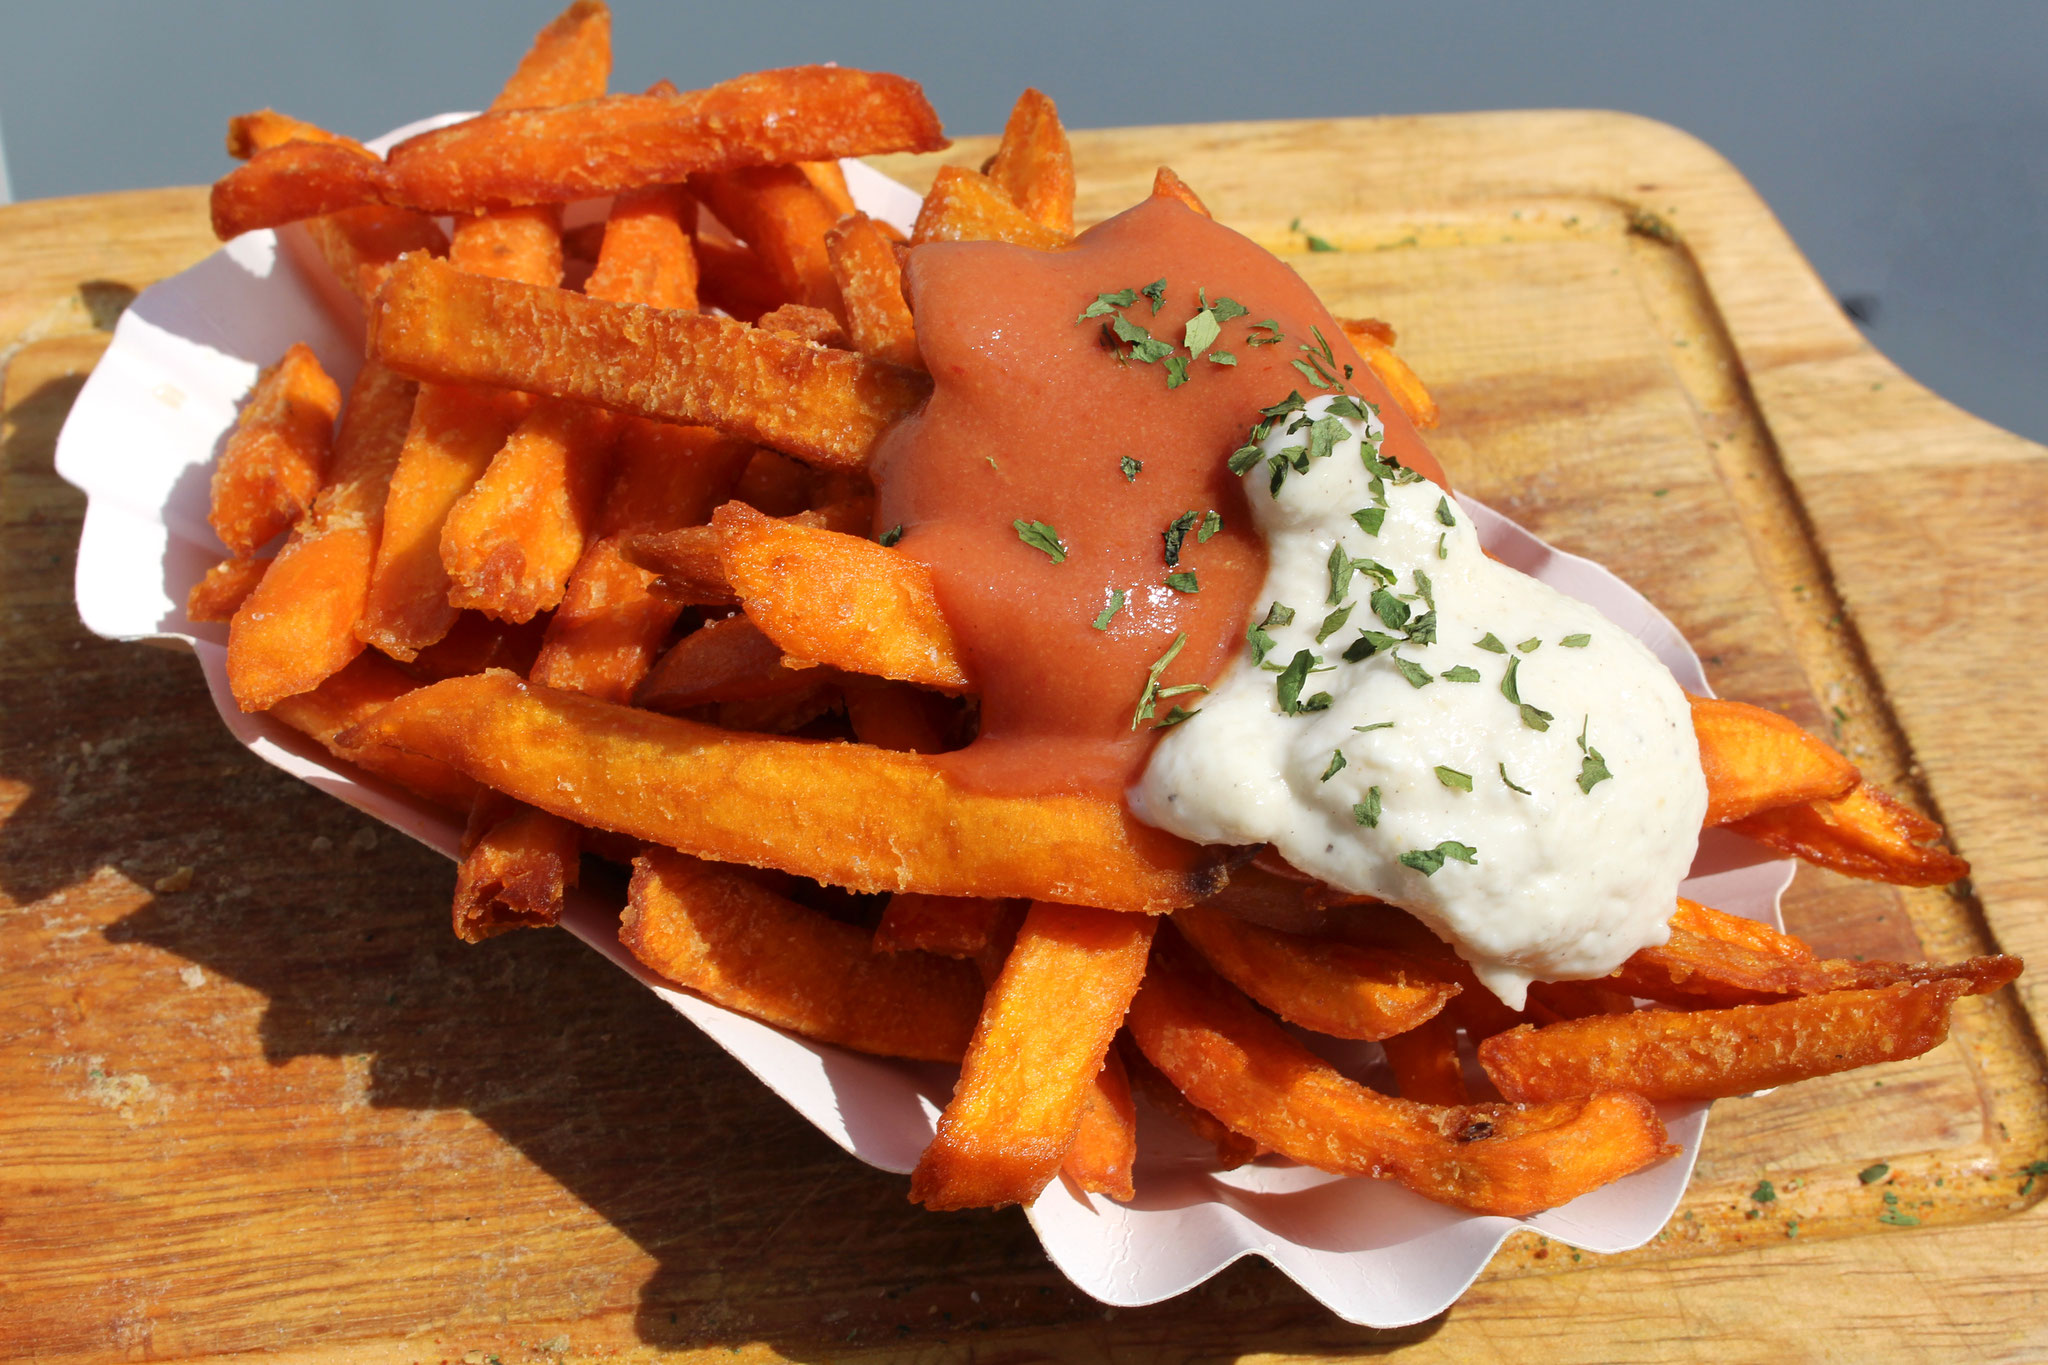 Sweetpotatofries Vegan Burger Catering Bonn